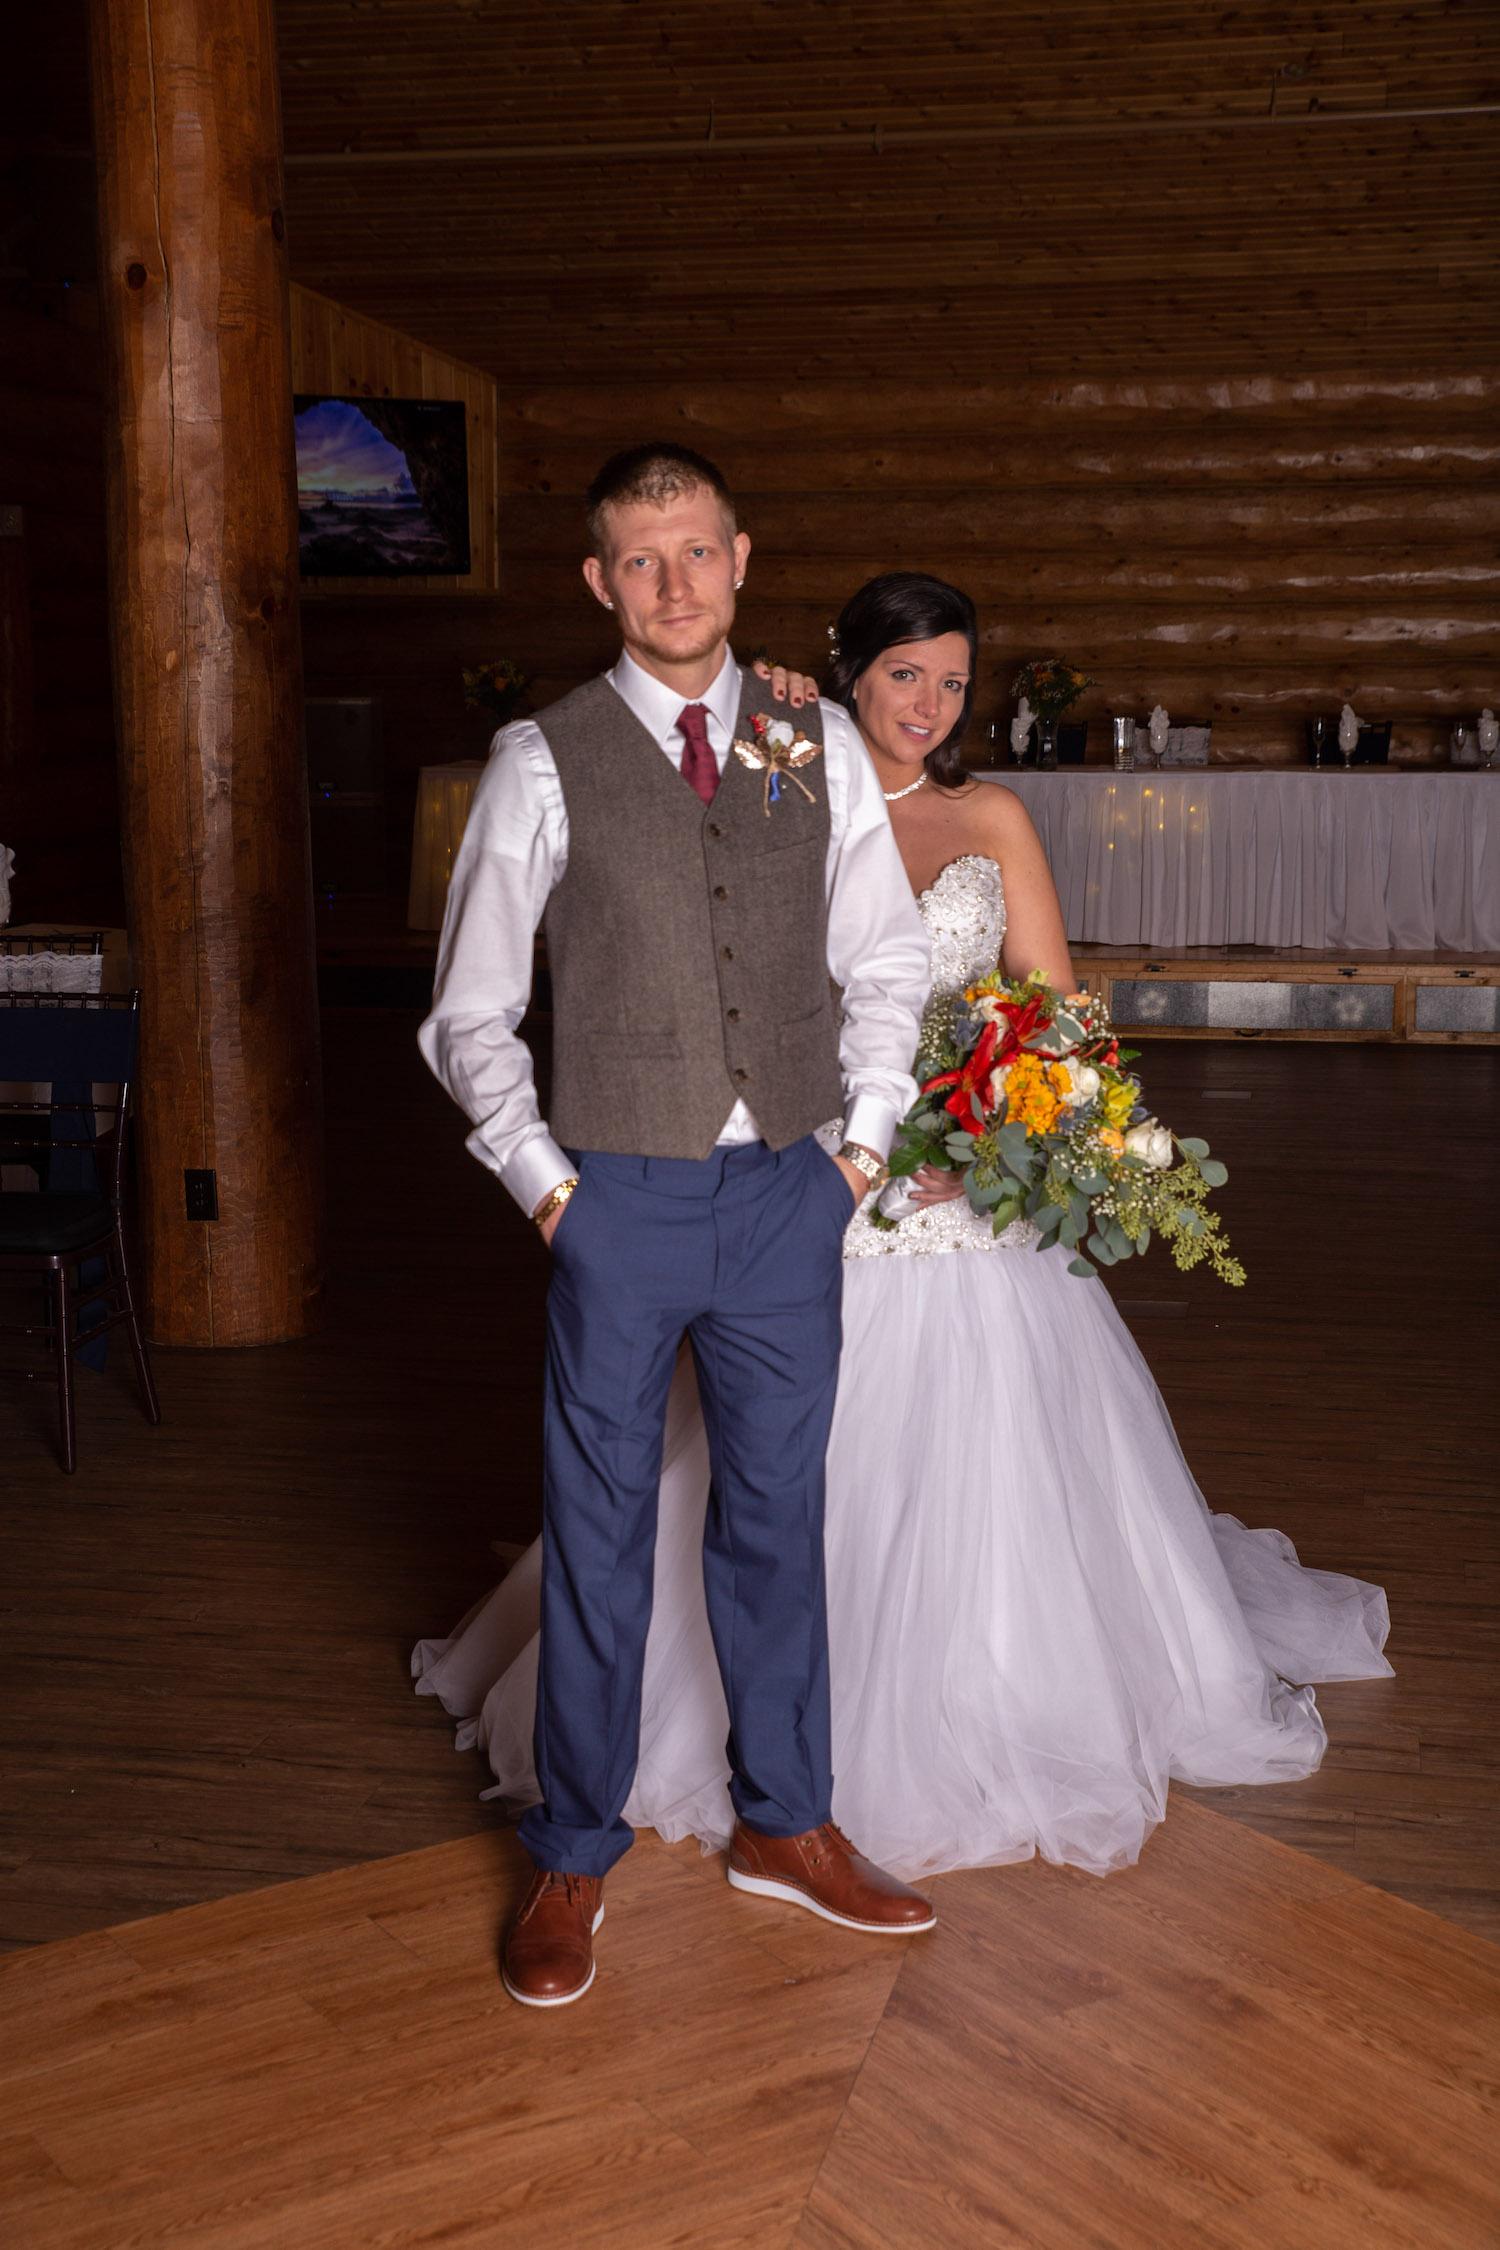 Glenhaven winter Minnesota wedding rustic barn, orange and yellow bouquet, groom in vest and navy pants